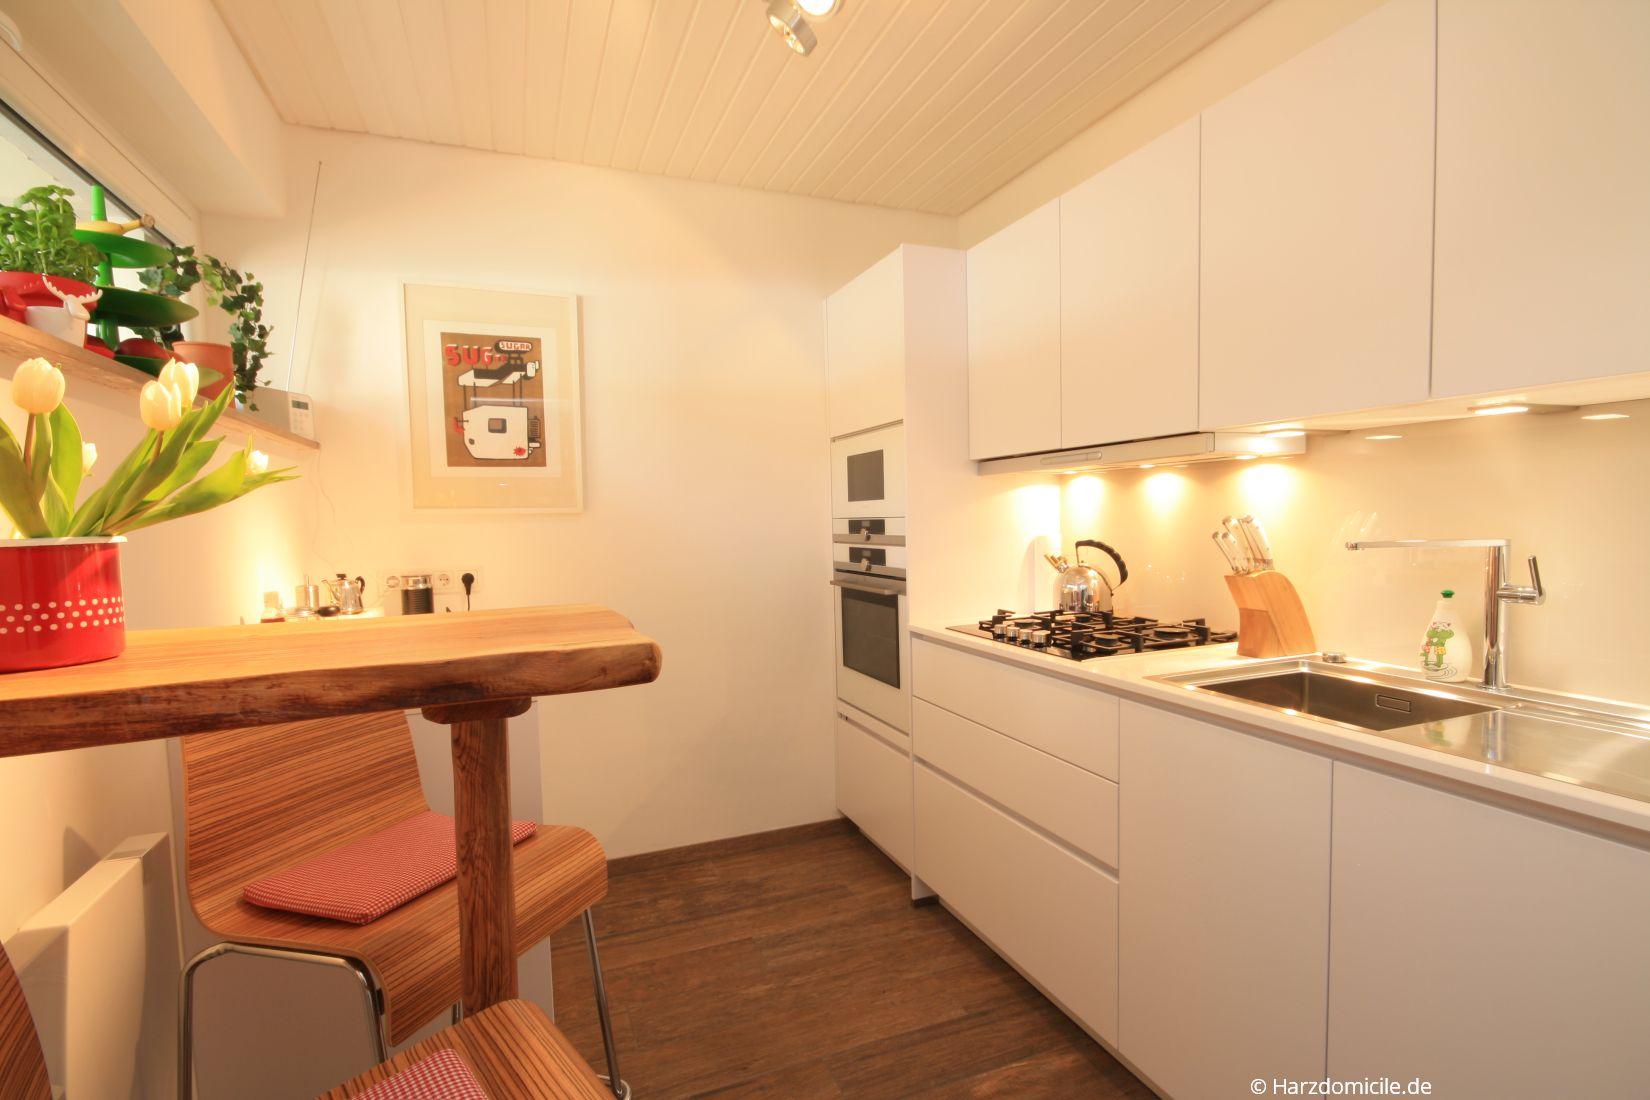 Küche – Hütteberg-Suite - Harzdomicile